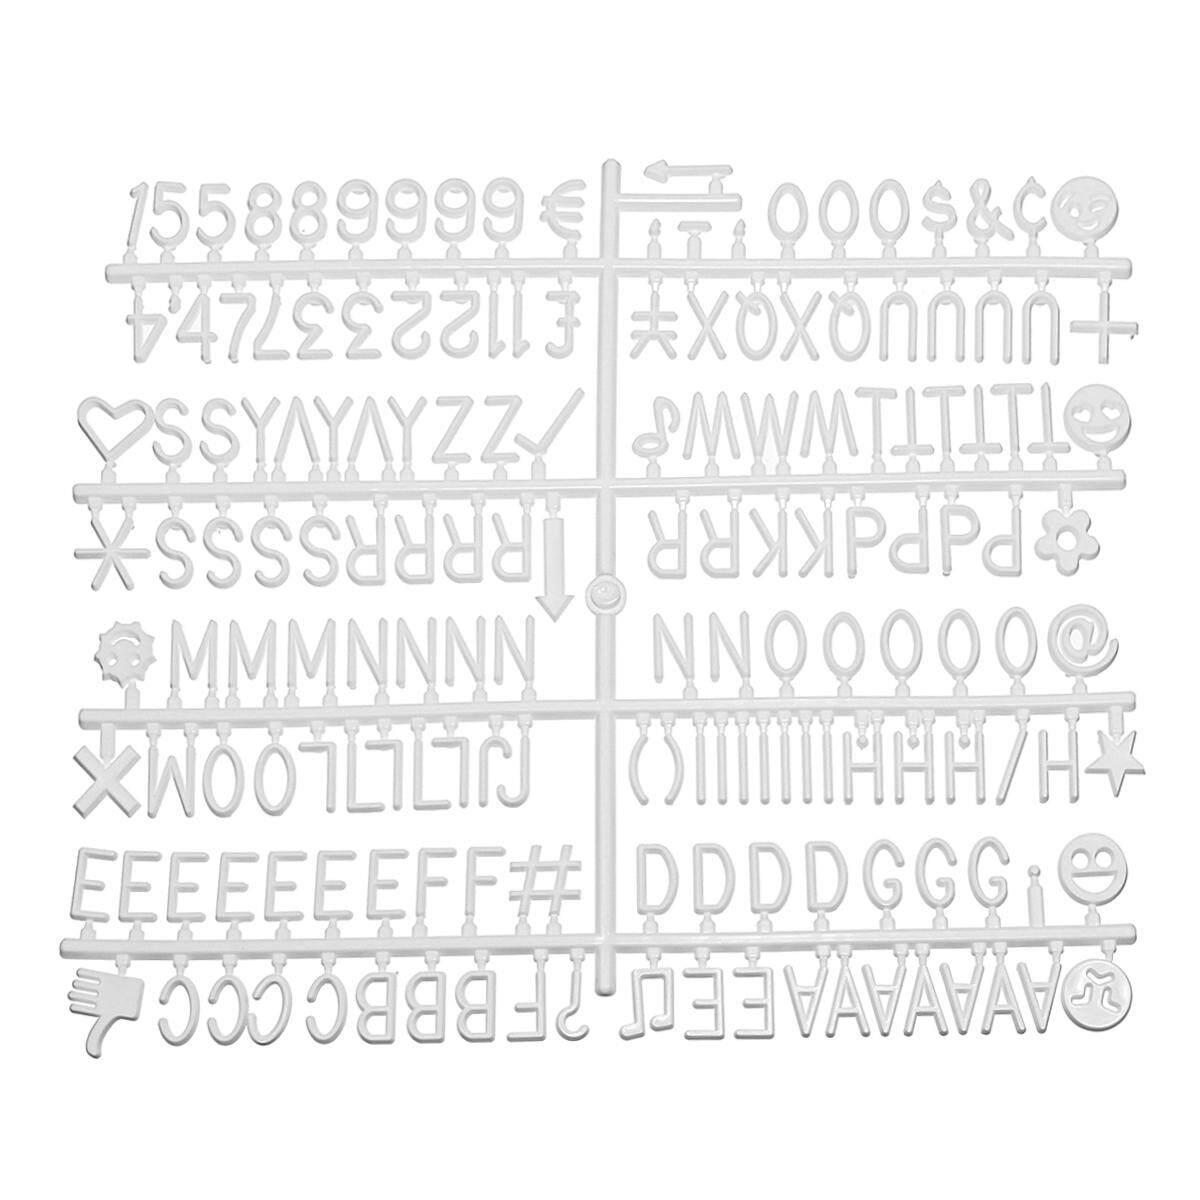 Rack Diy Letter Board Sign To Do List Reminder Memo Signage Felt Display Decor Pin By Glimmer.